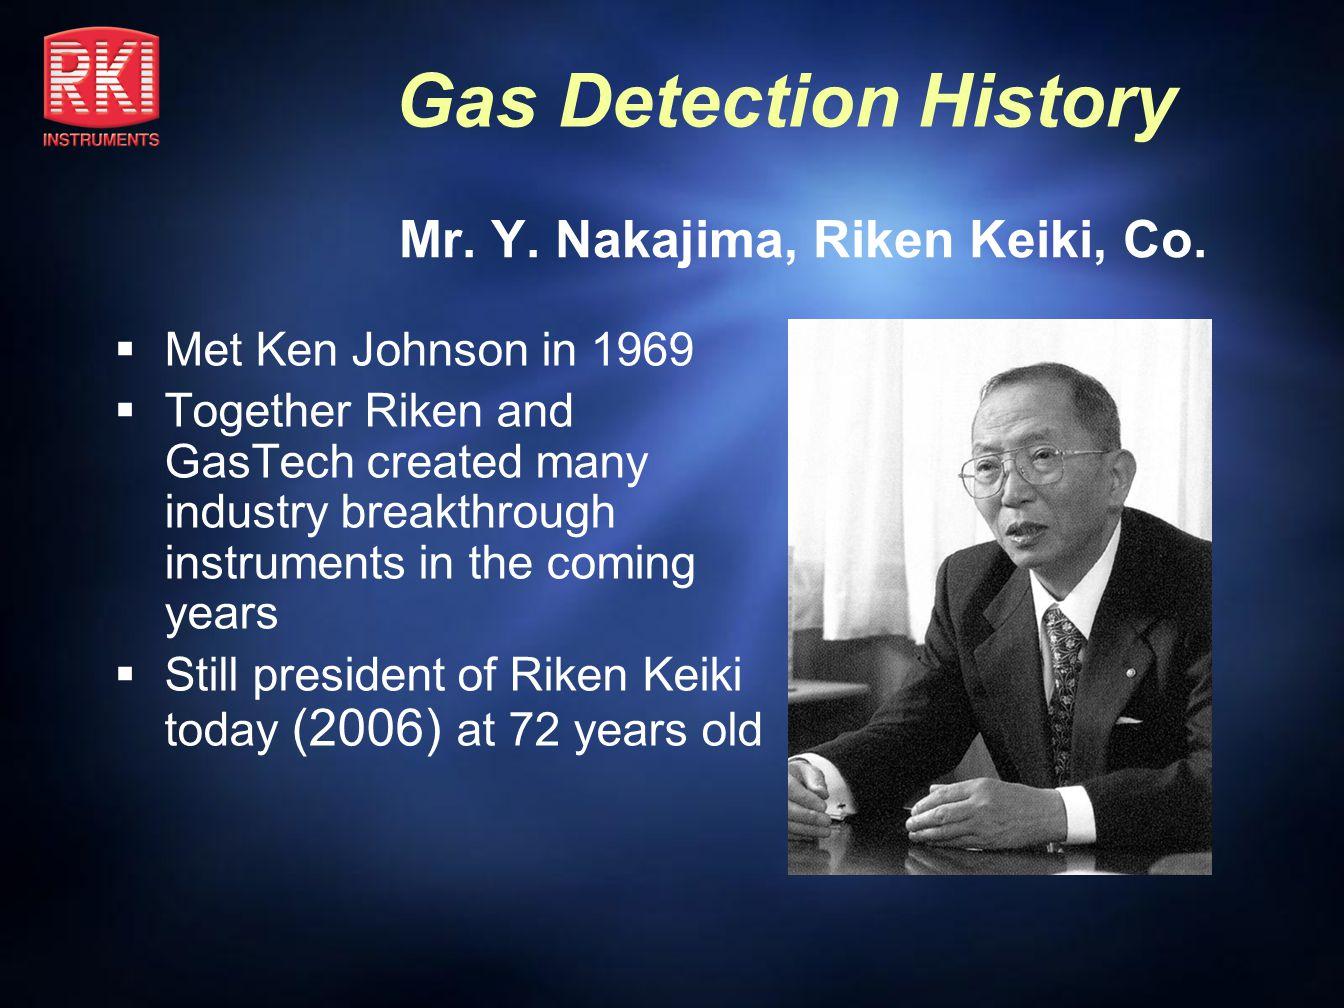 Mr. Y. Nakajima, Riken Keiki, Co.